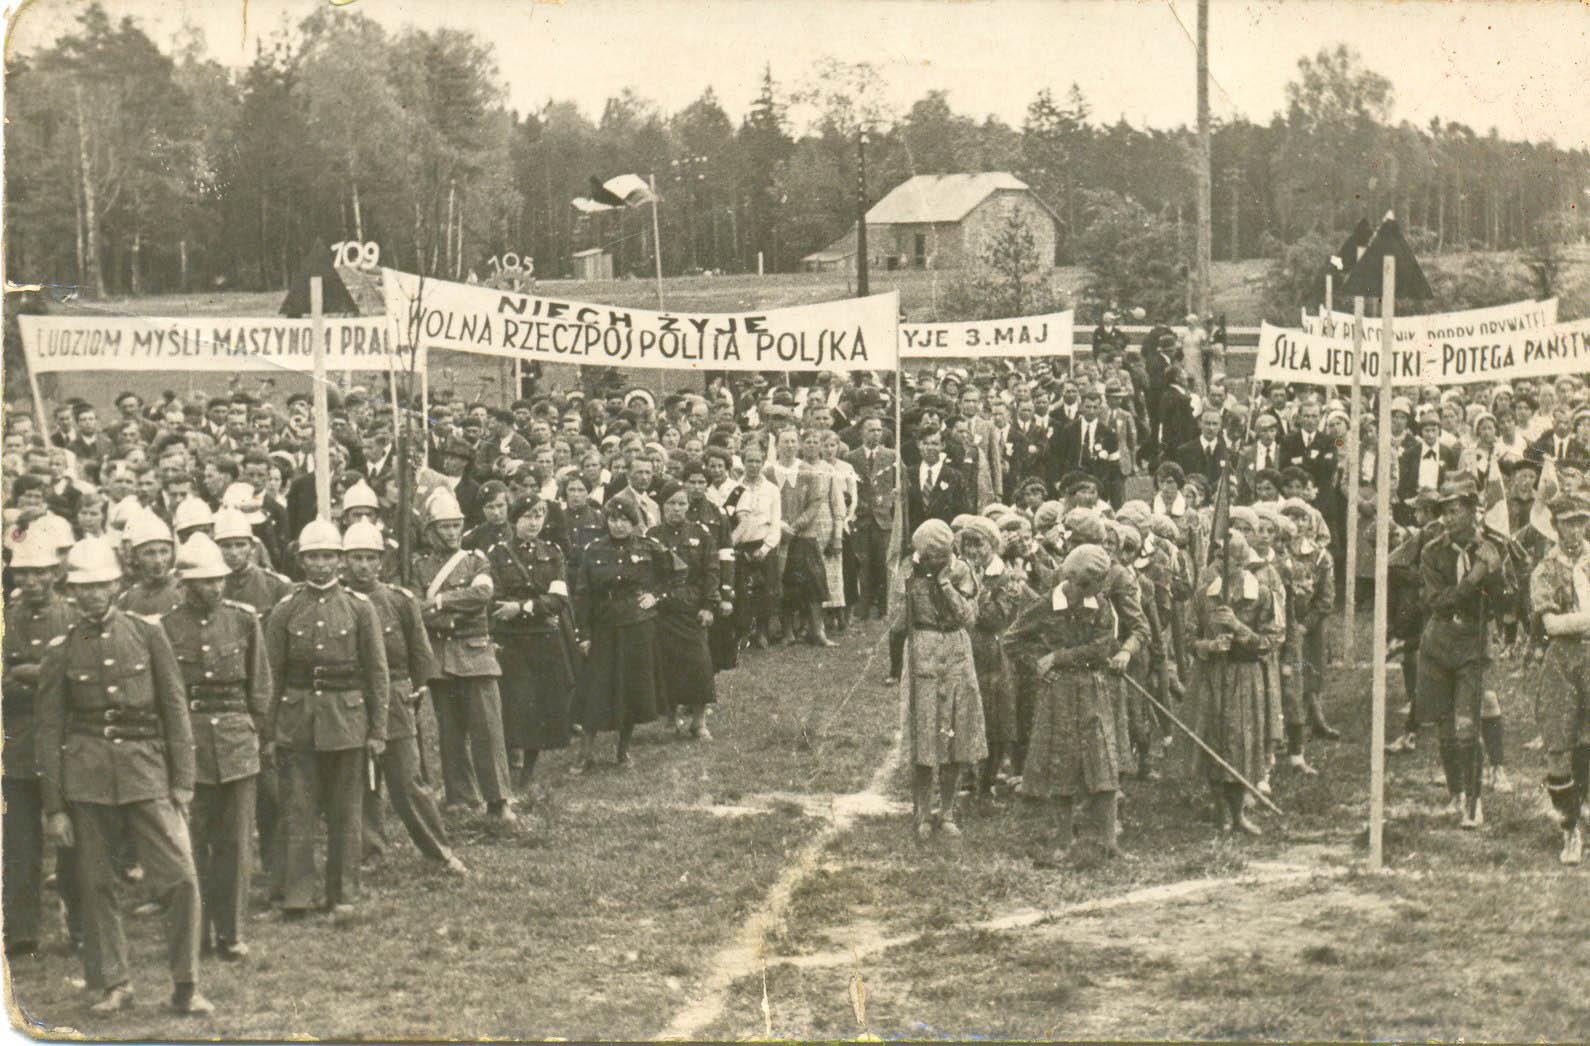 Bata factory parade. Tomasz Batta Memorial House